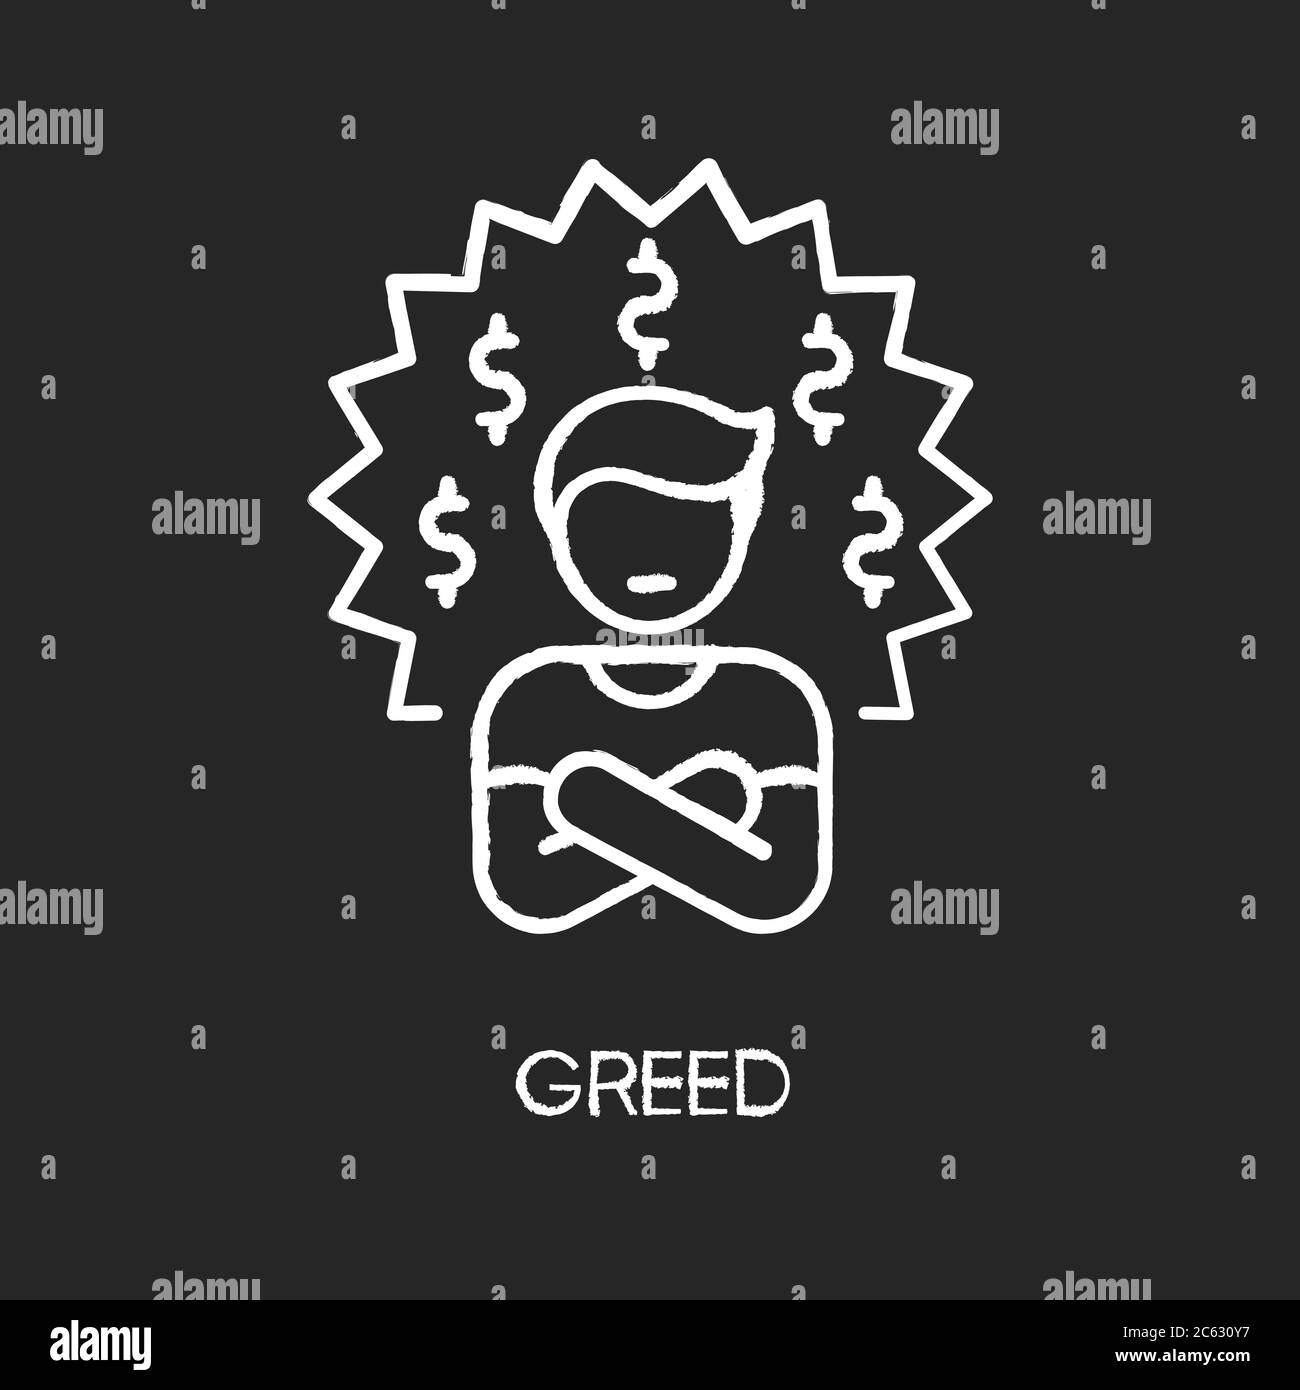 https www alamy com greed chalk white icon on black background image365172283 html